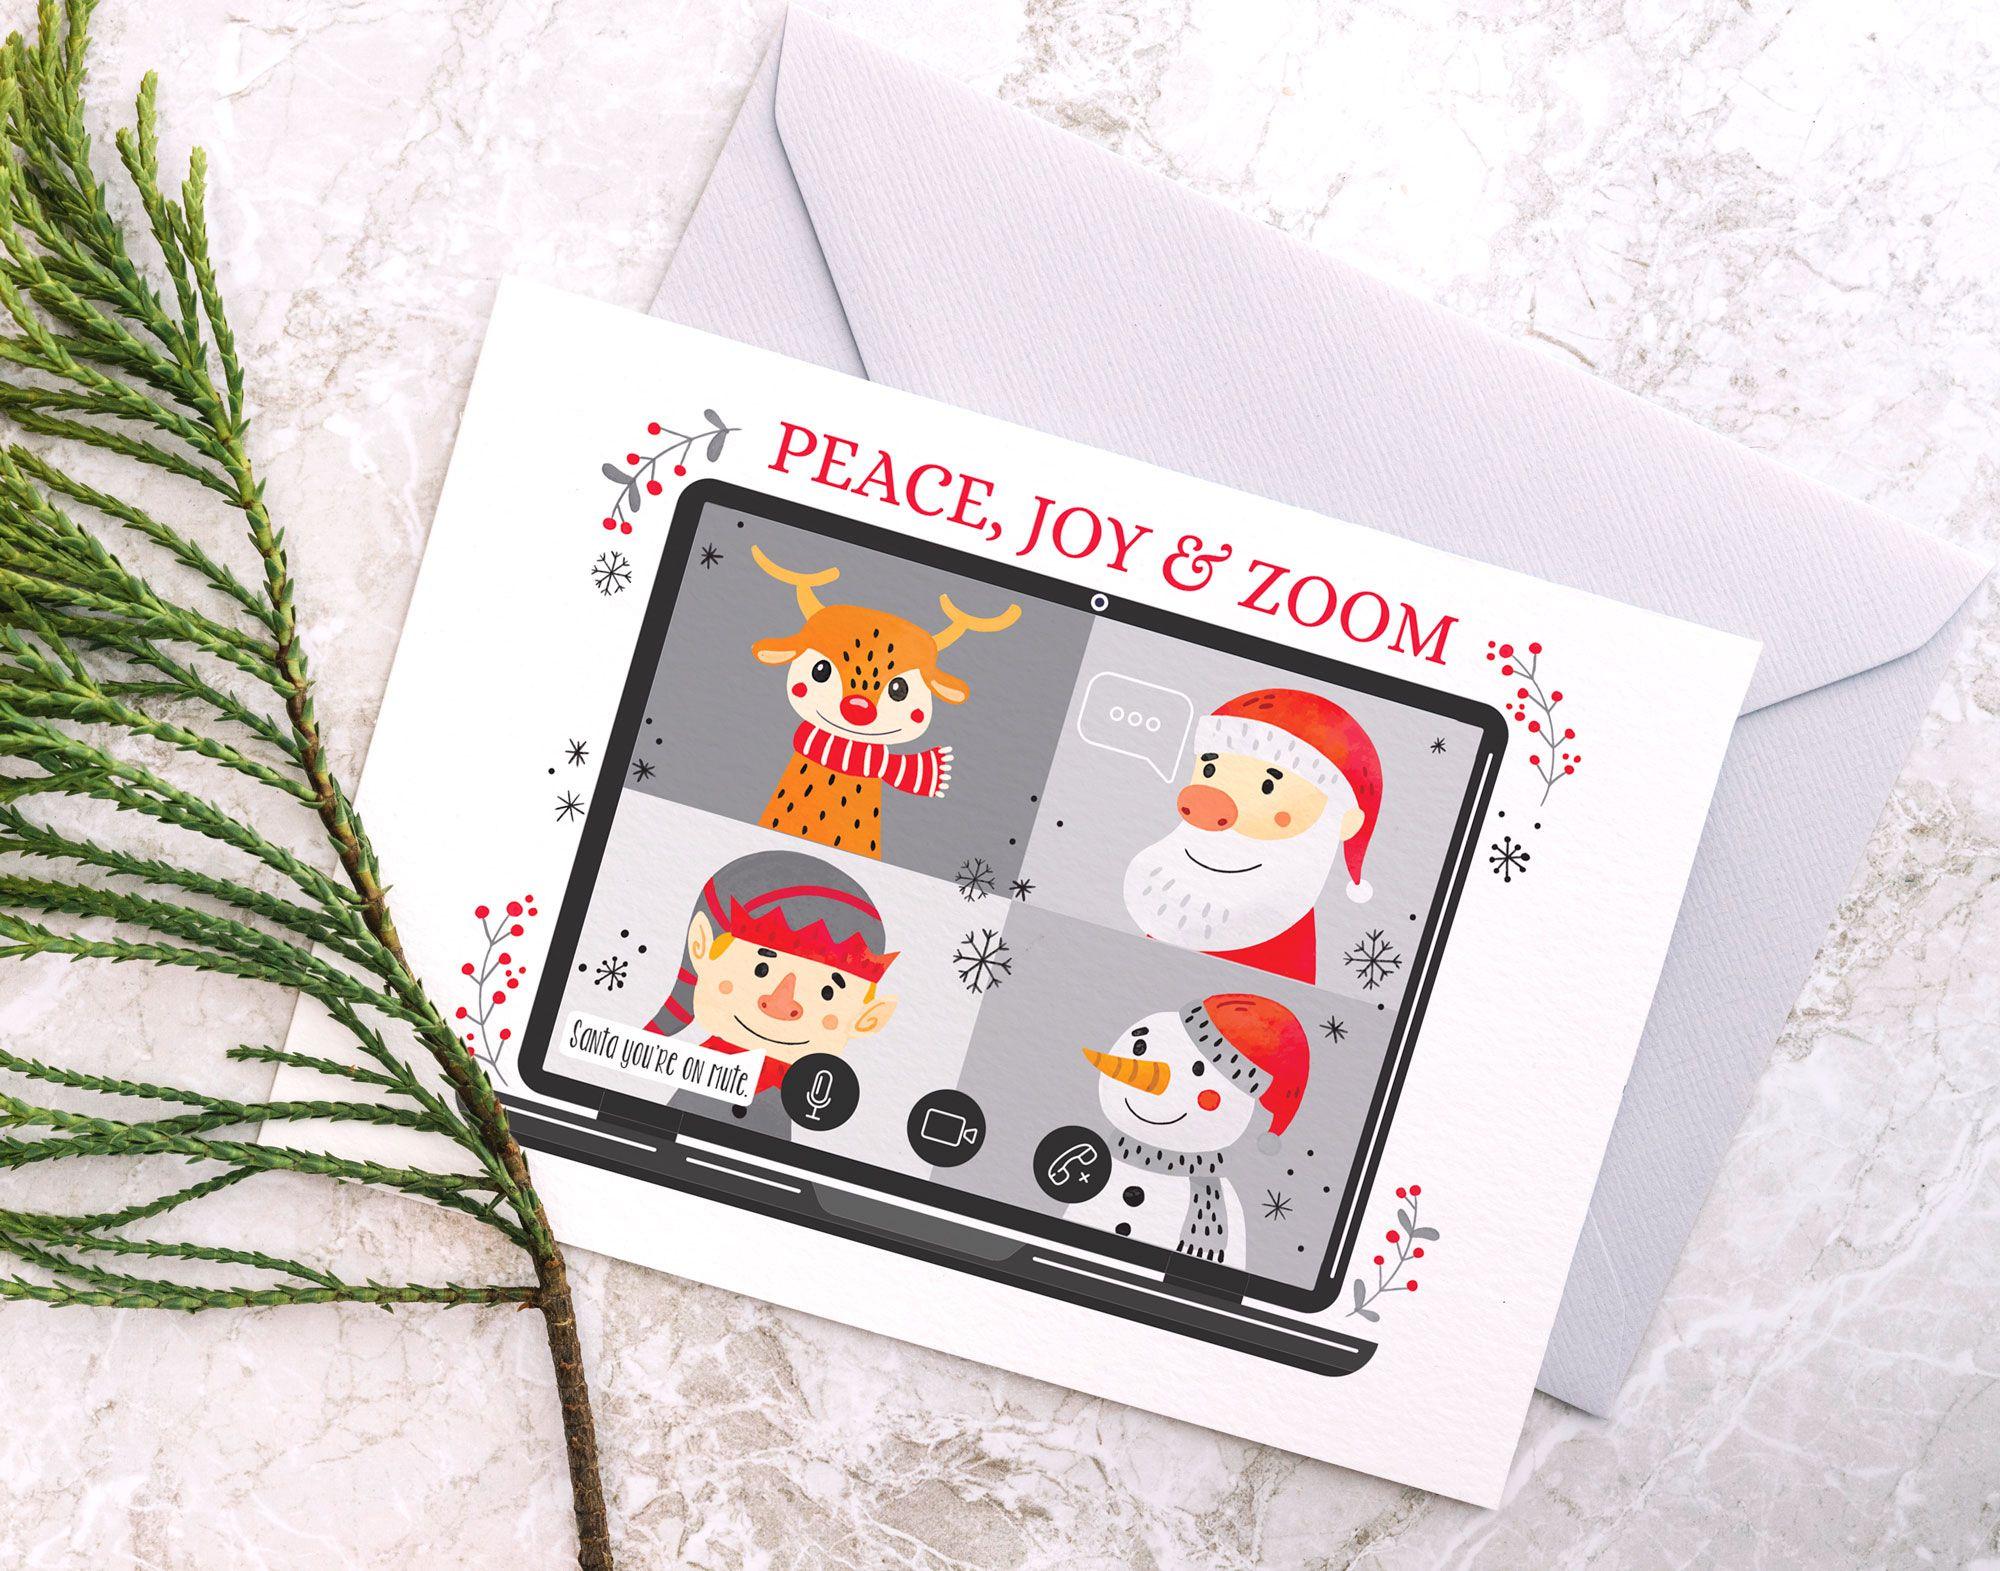 Peace Joy Zoom Printable Christmas Card Social Distancing Etsy Christmas Cards Printable Christmas Cards Printable Cards